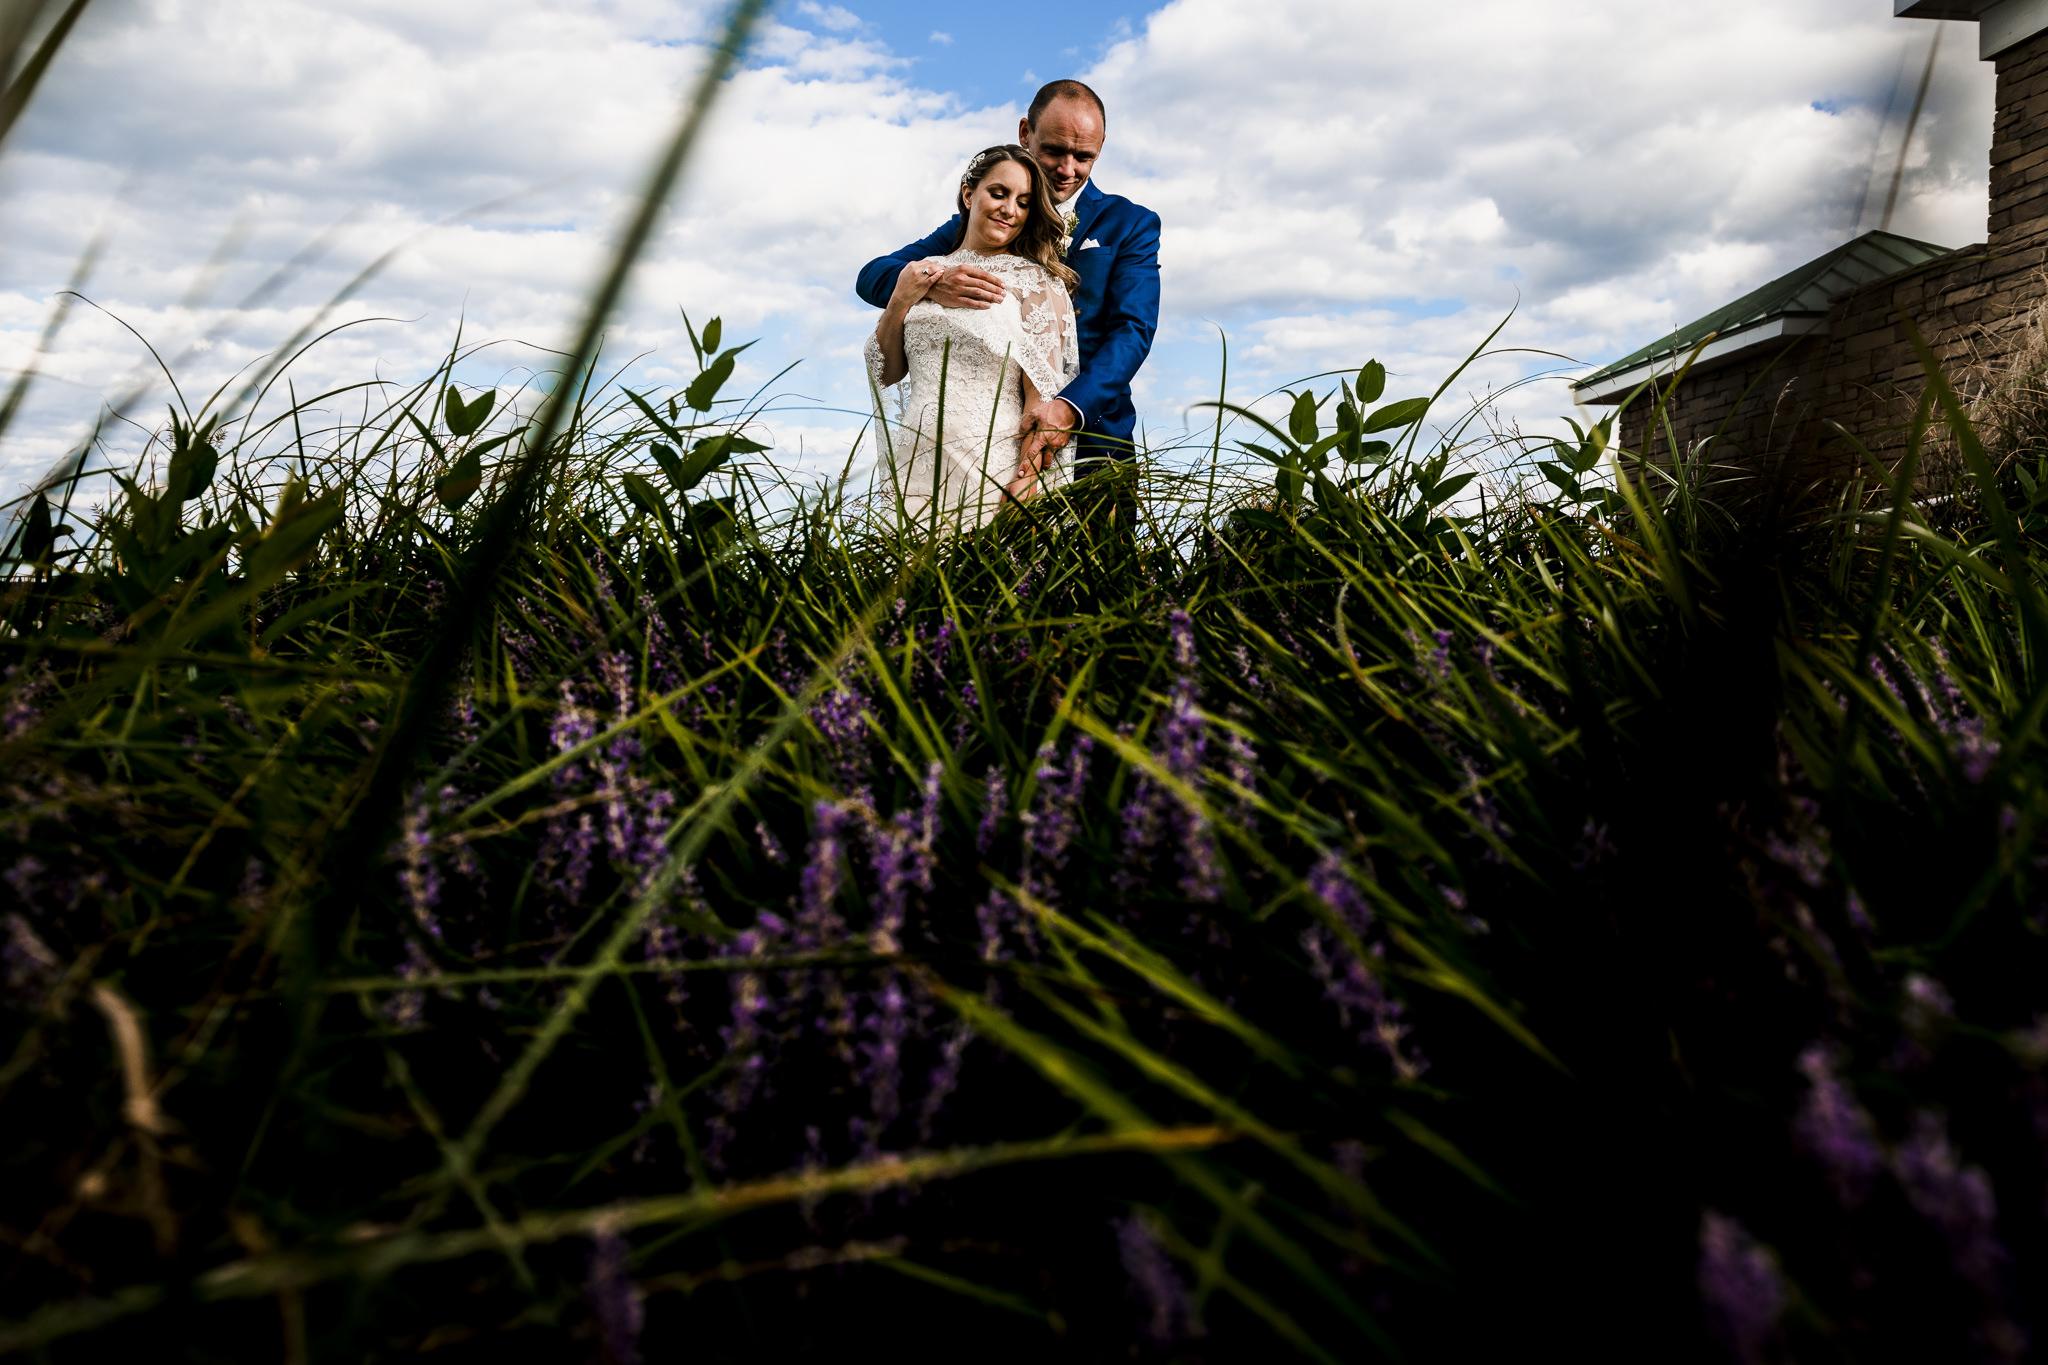 Culos-Sheraton-Eatontown-Long-Branch-Wedding-Photographer-15.JPG